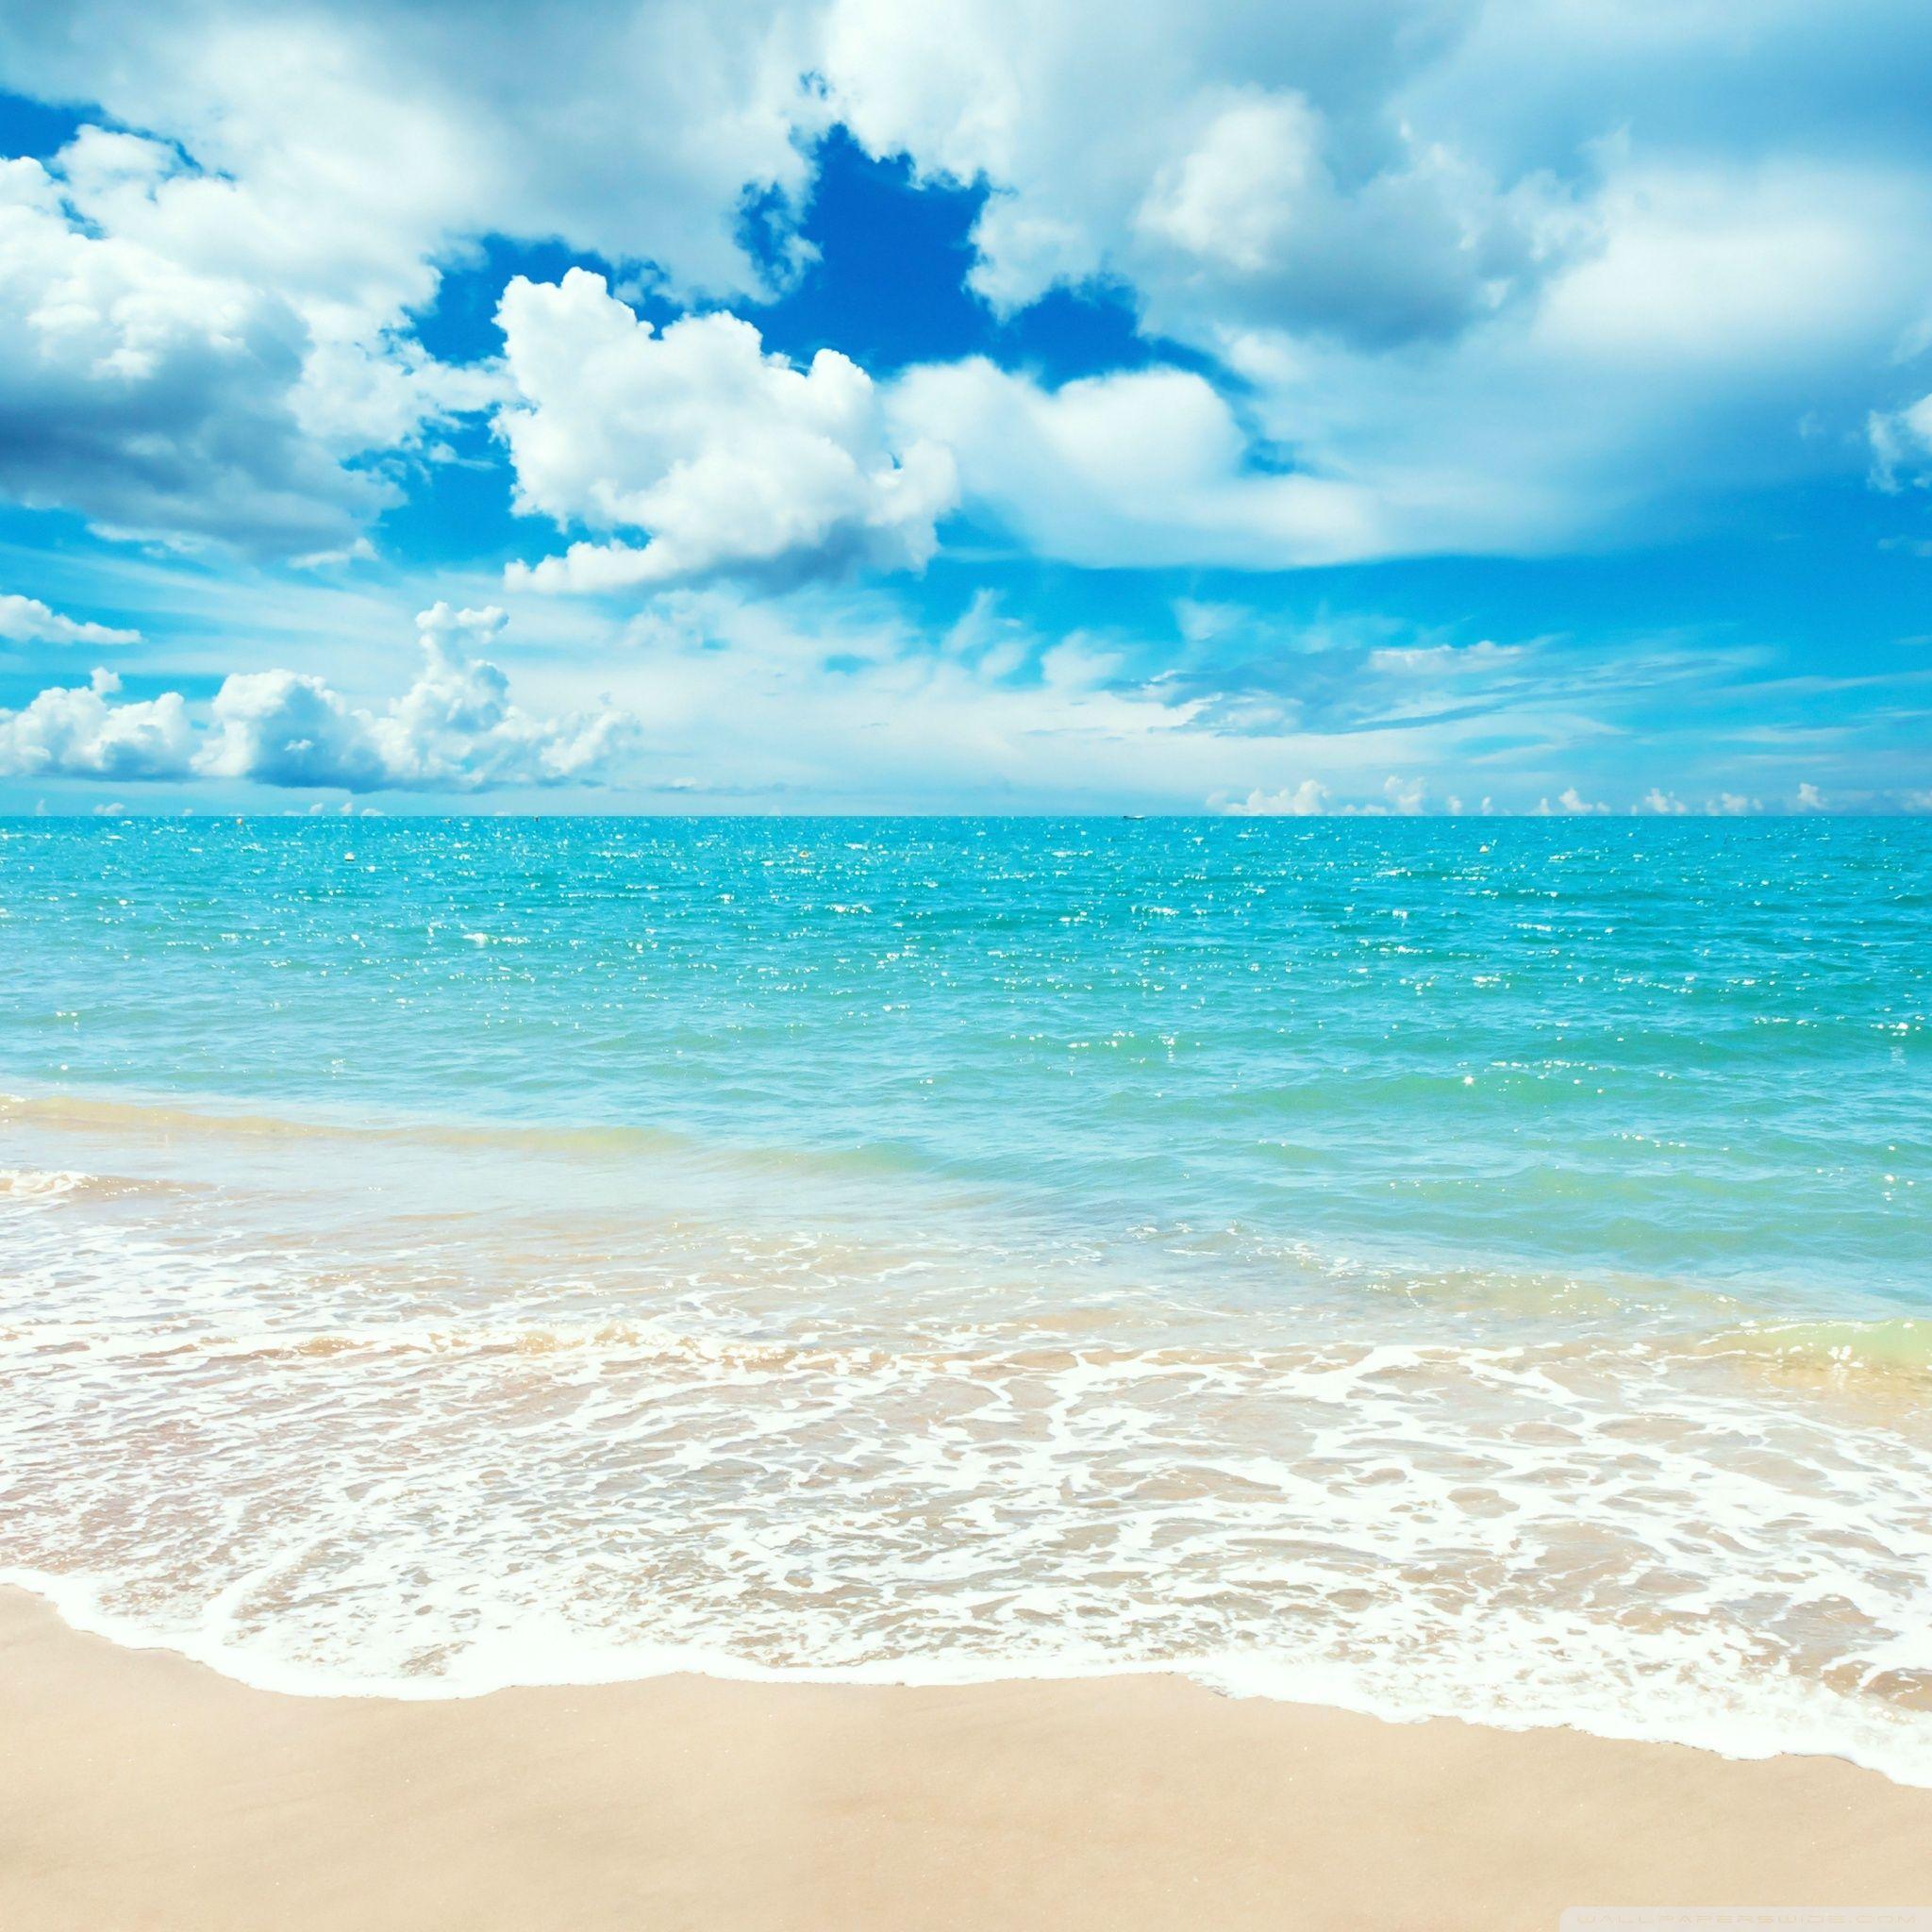 Images Ipad Download Windows Wallpapers Hd Download Cool Beach Wallpaper Ocean Wallpaper Summer Wallpaper